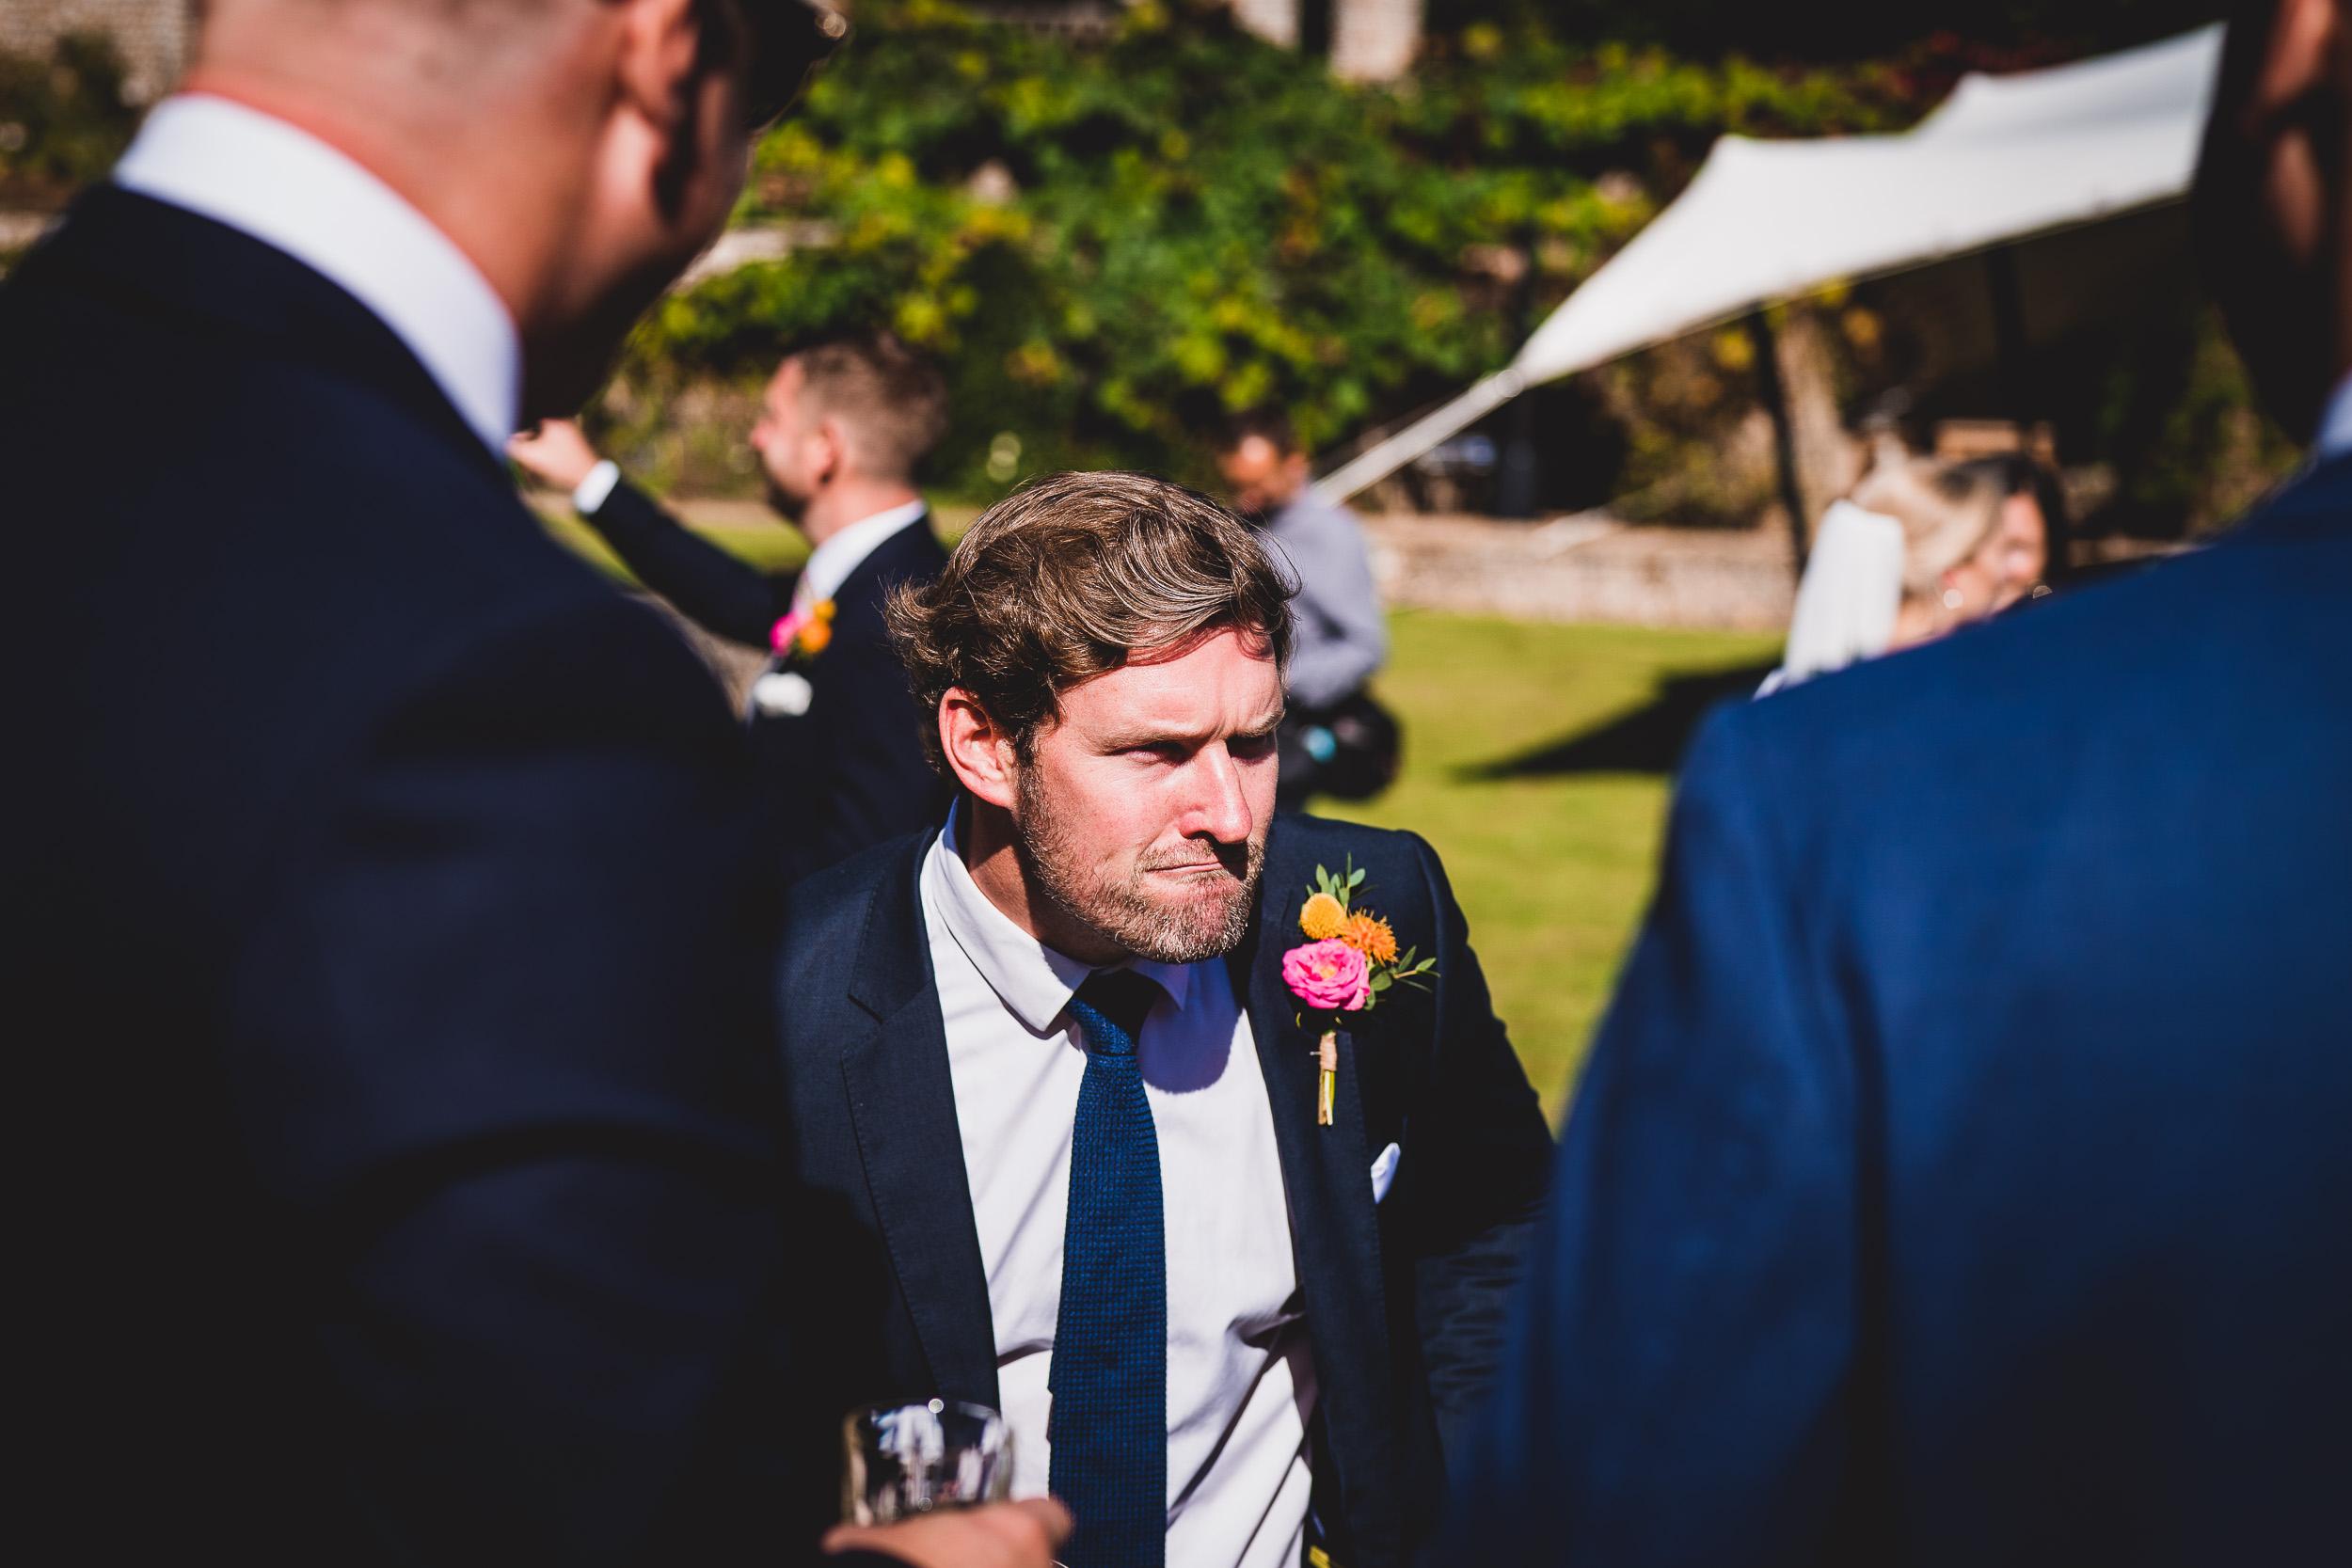 Voewood Wedding Photography | Al & Clancy Al ss 060